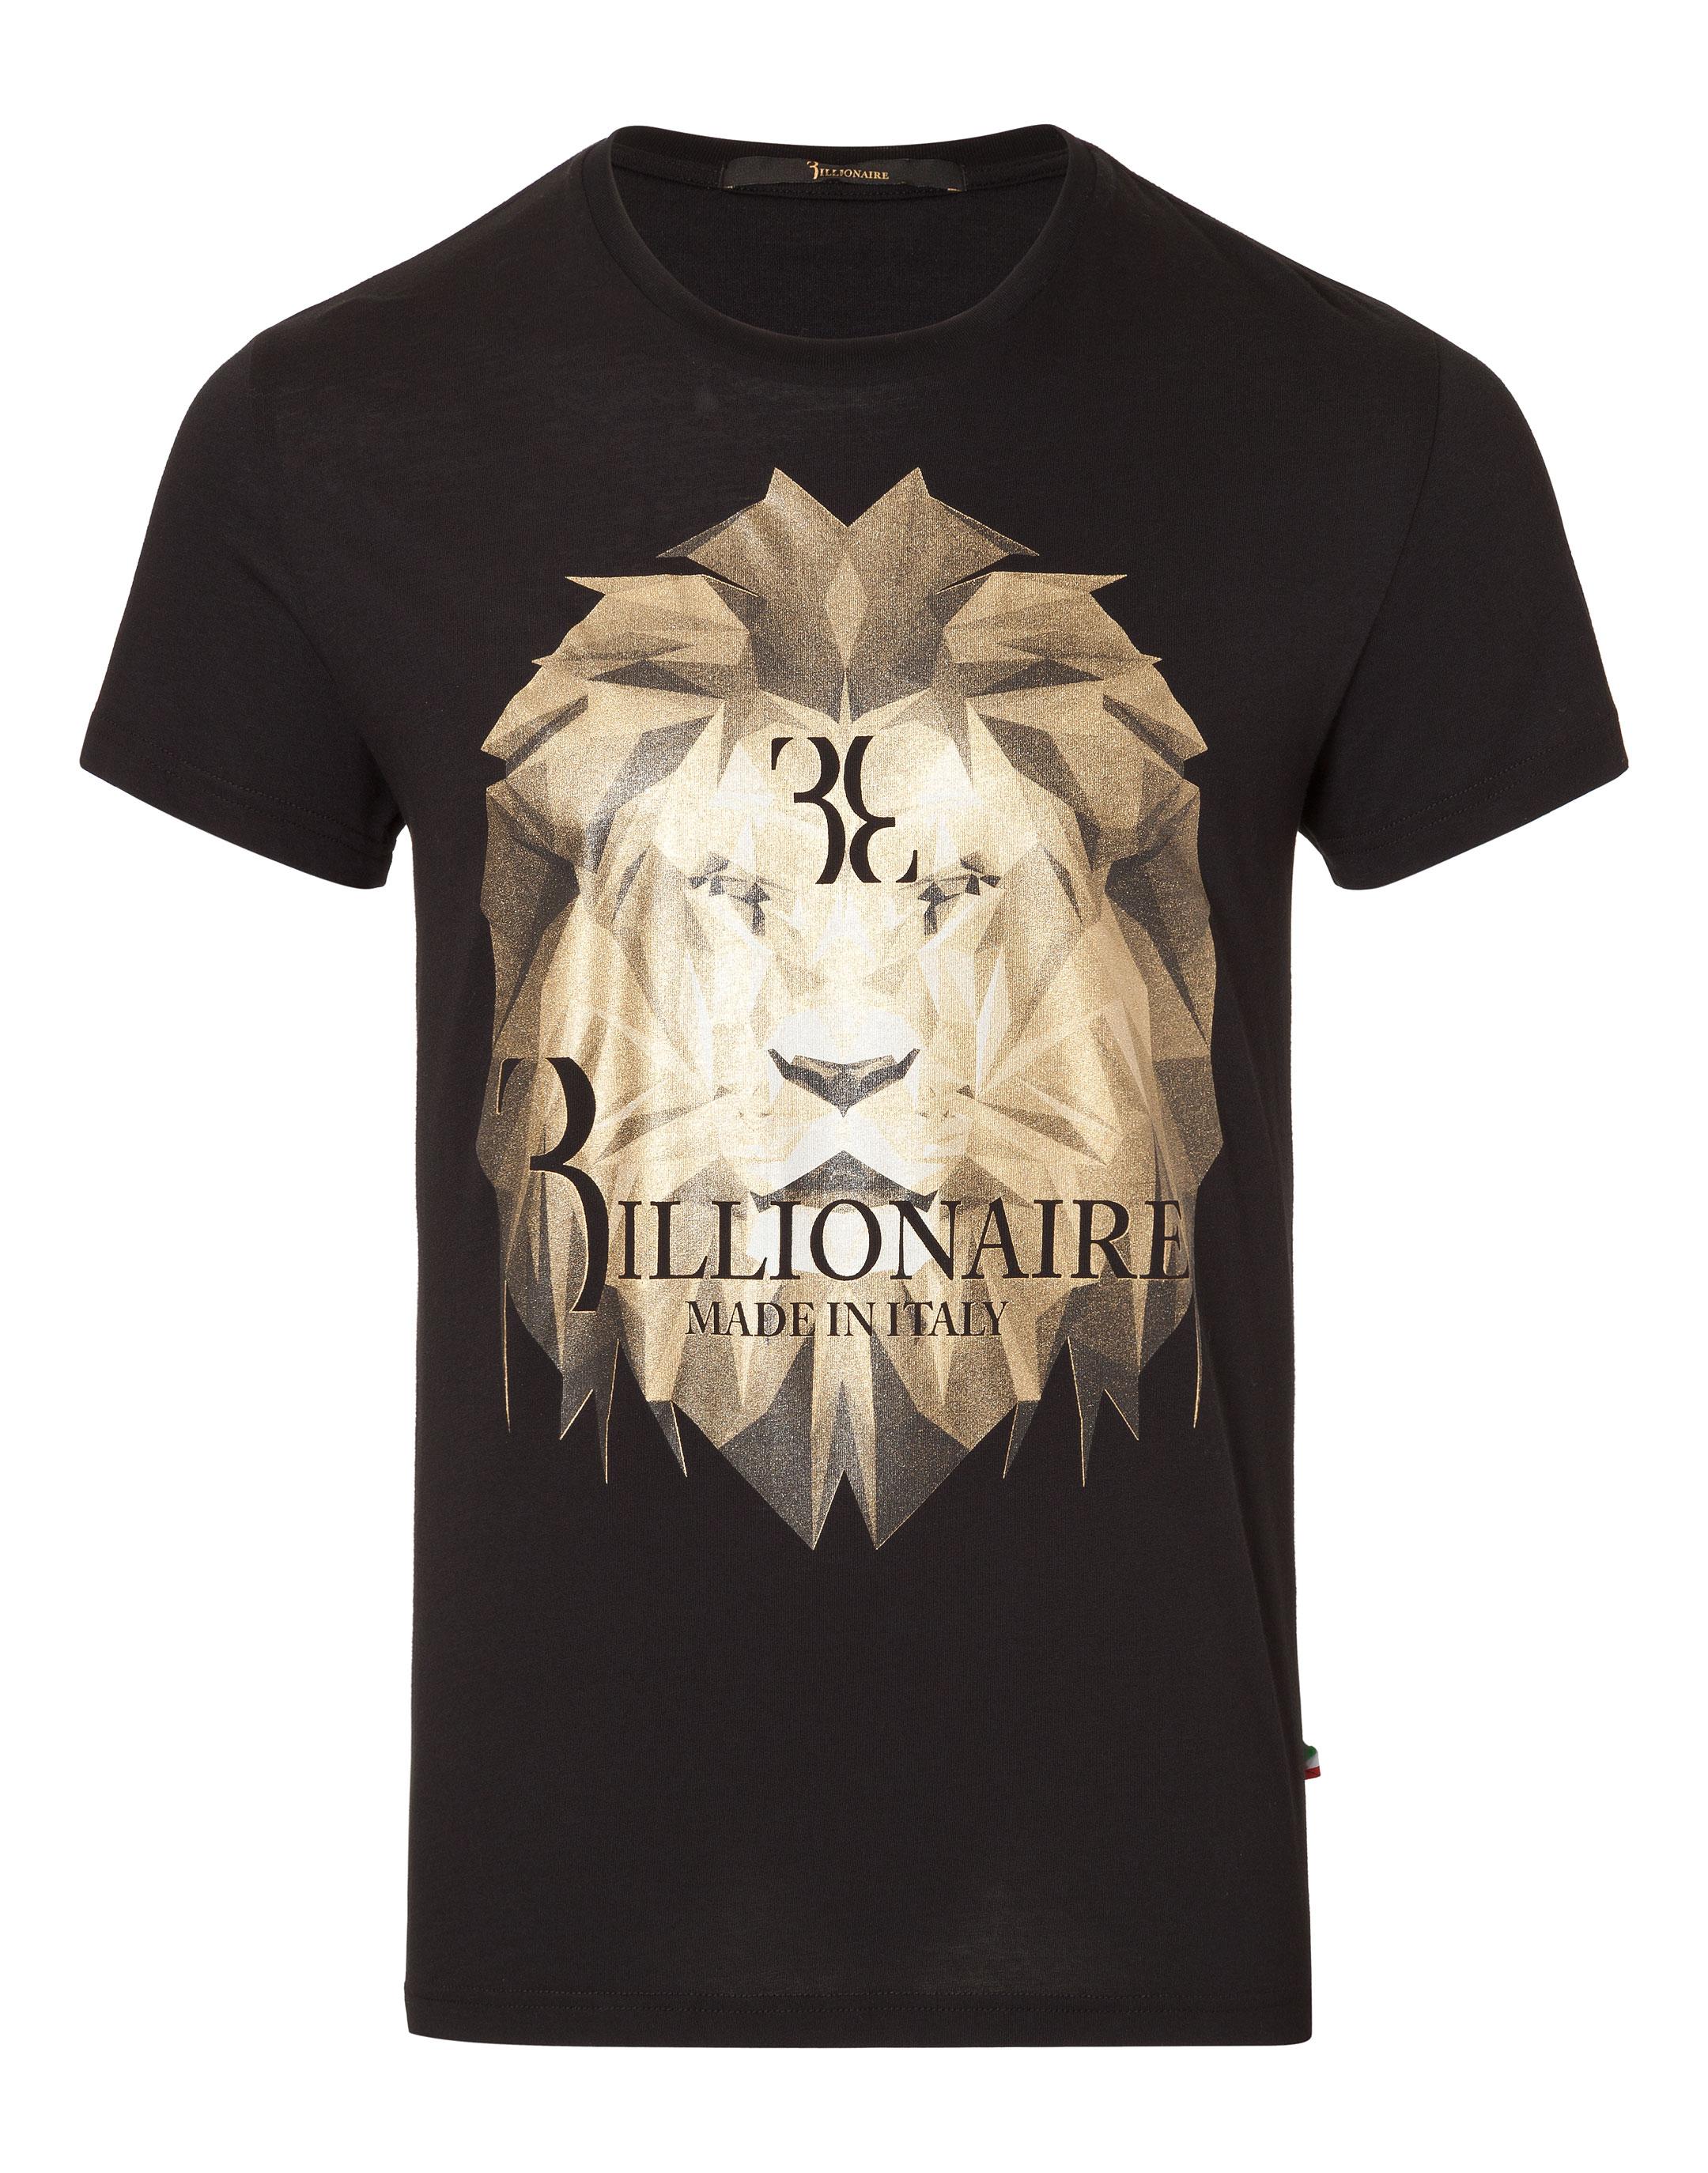 Black t shirt round neck - T Shirt Round Neck Ss